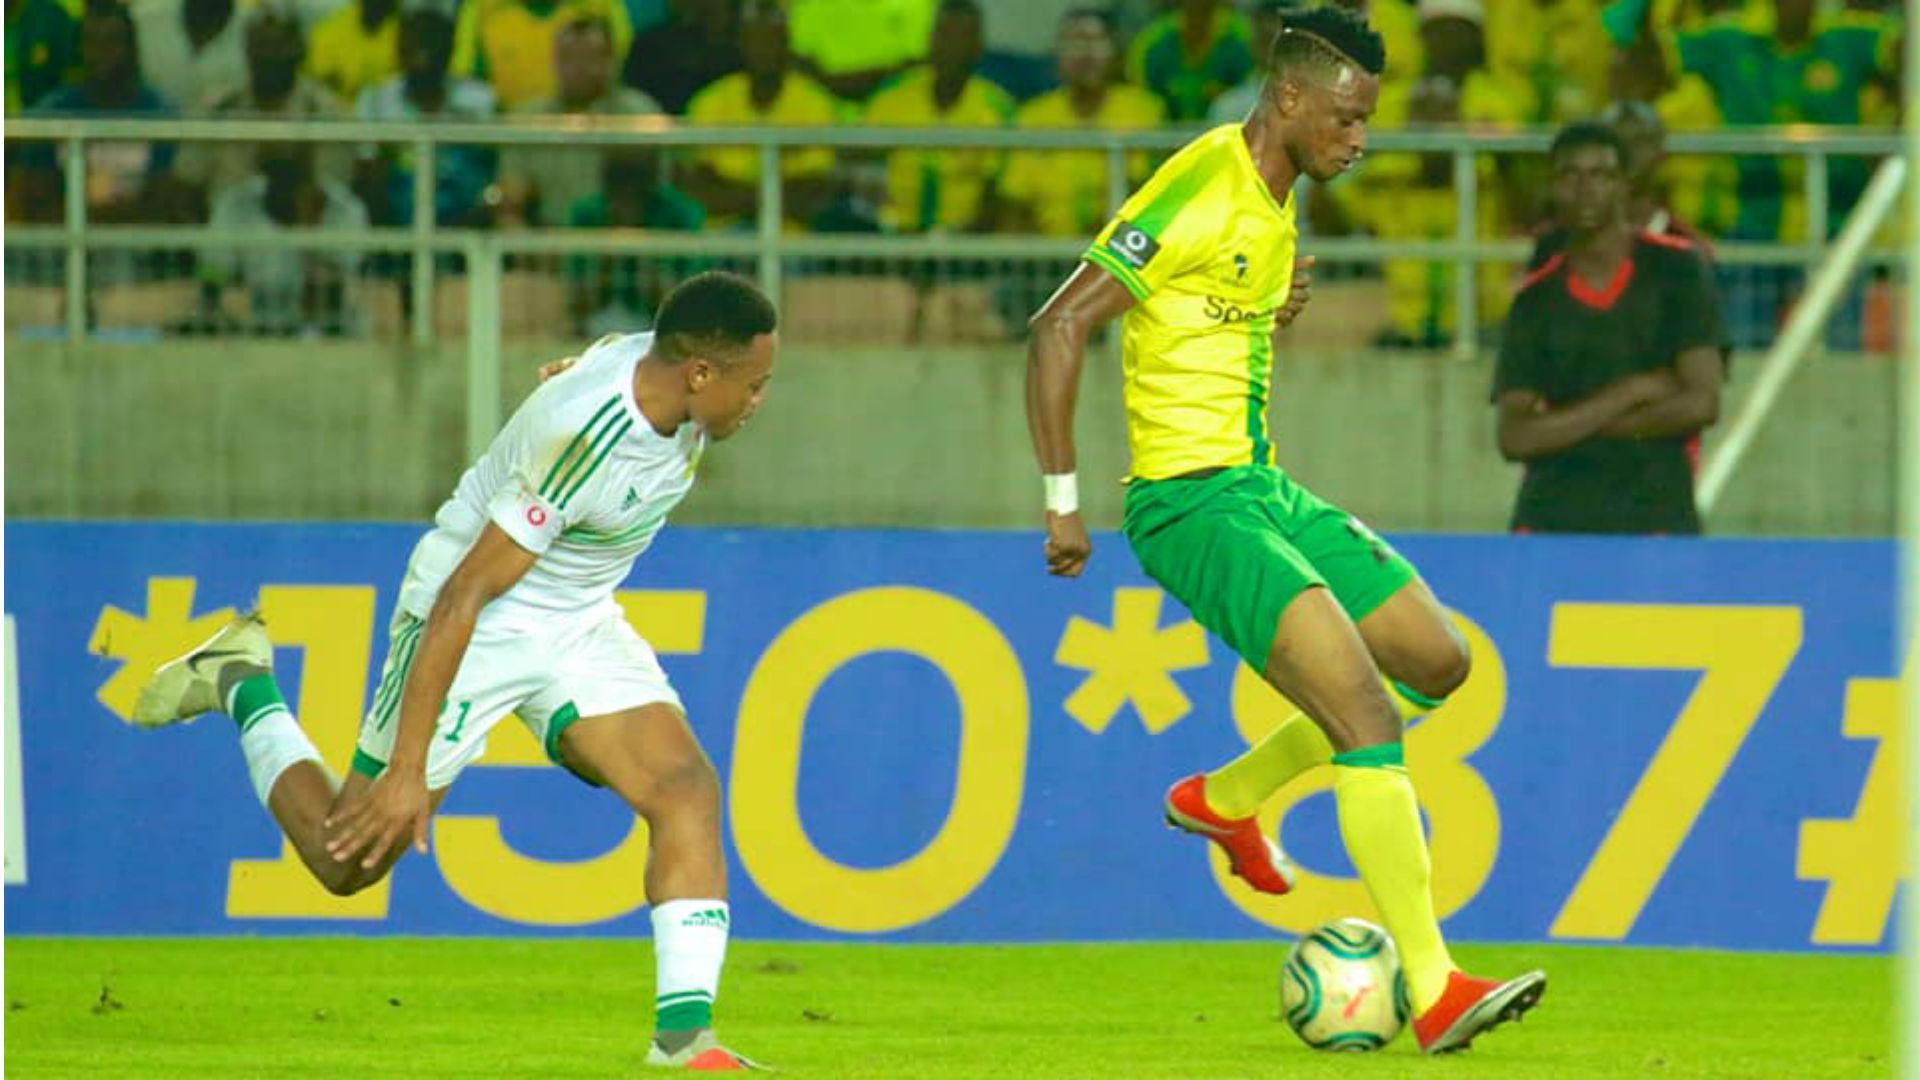 Kisinda: I am yet to reach my playing level at Yanga SC